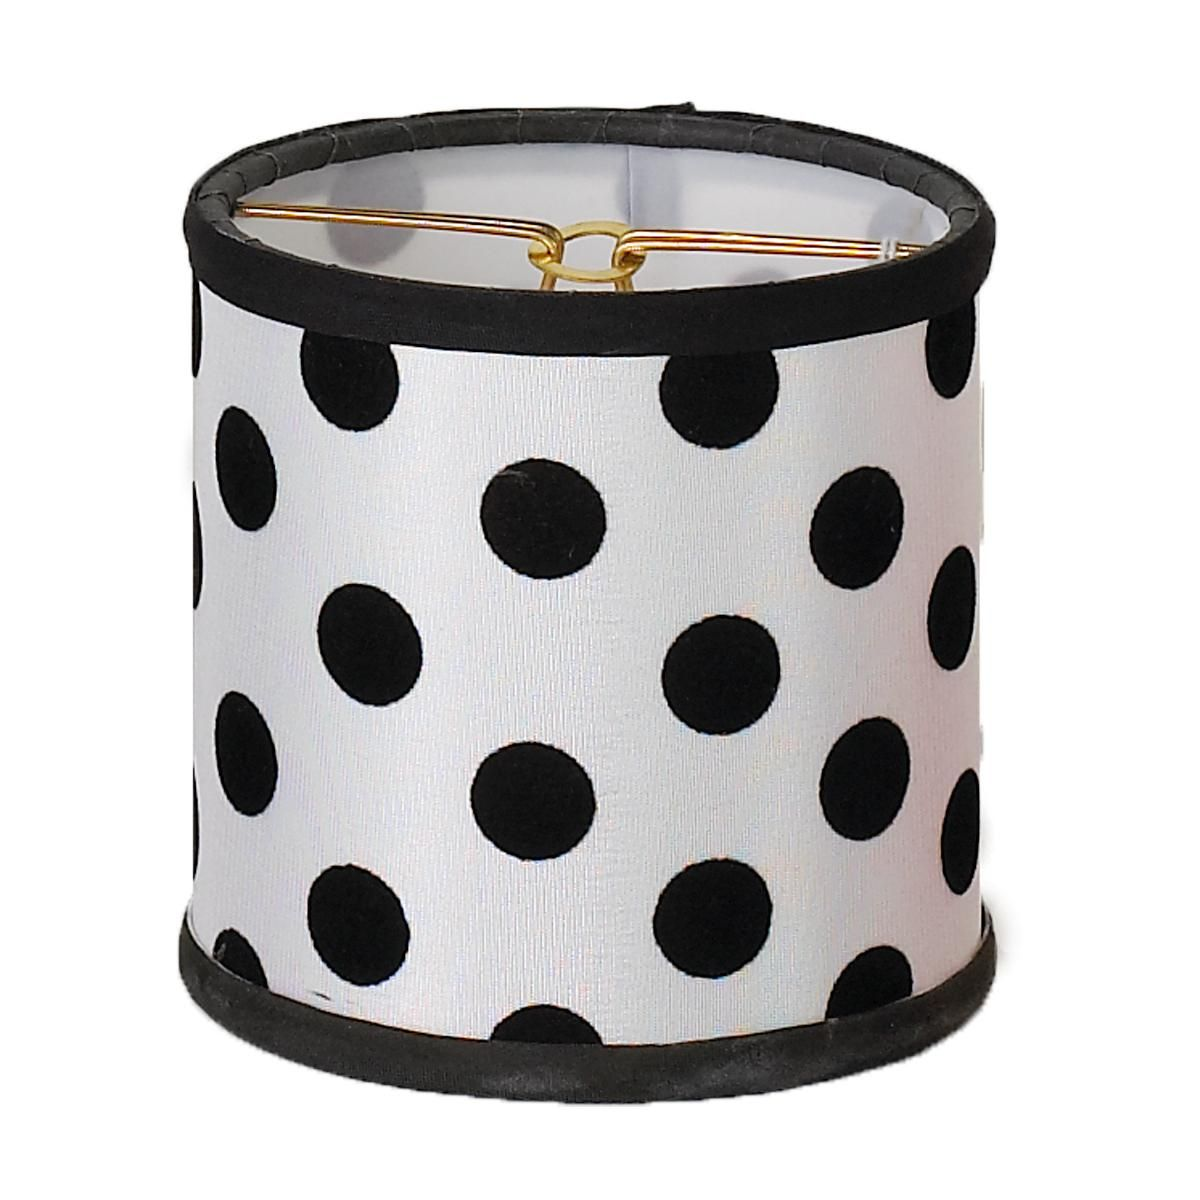 4 Black And White Polka Dot Chandelier Shade